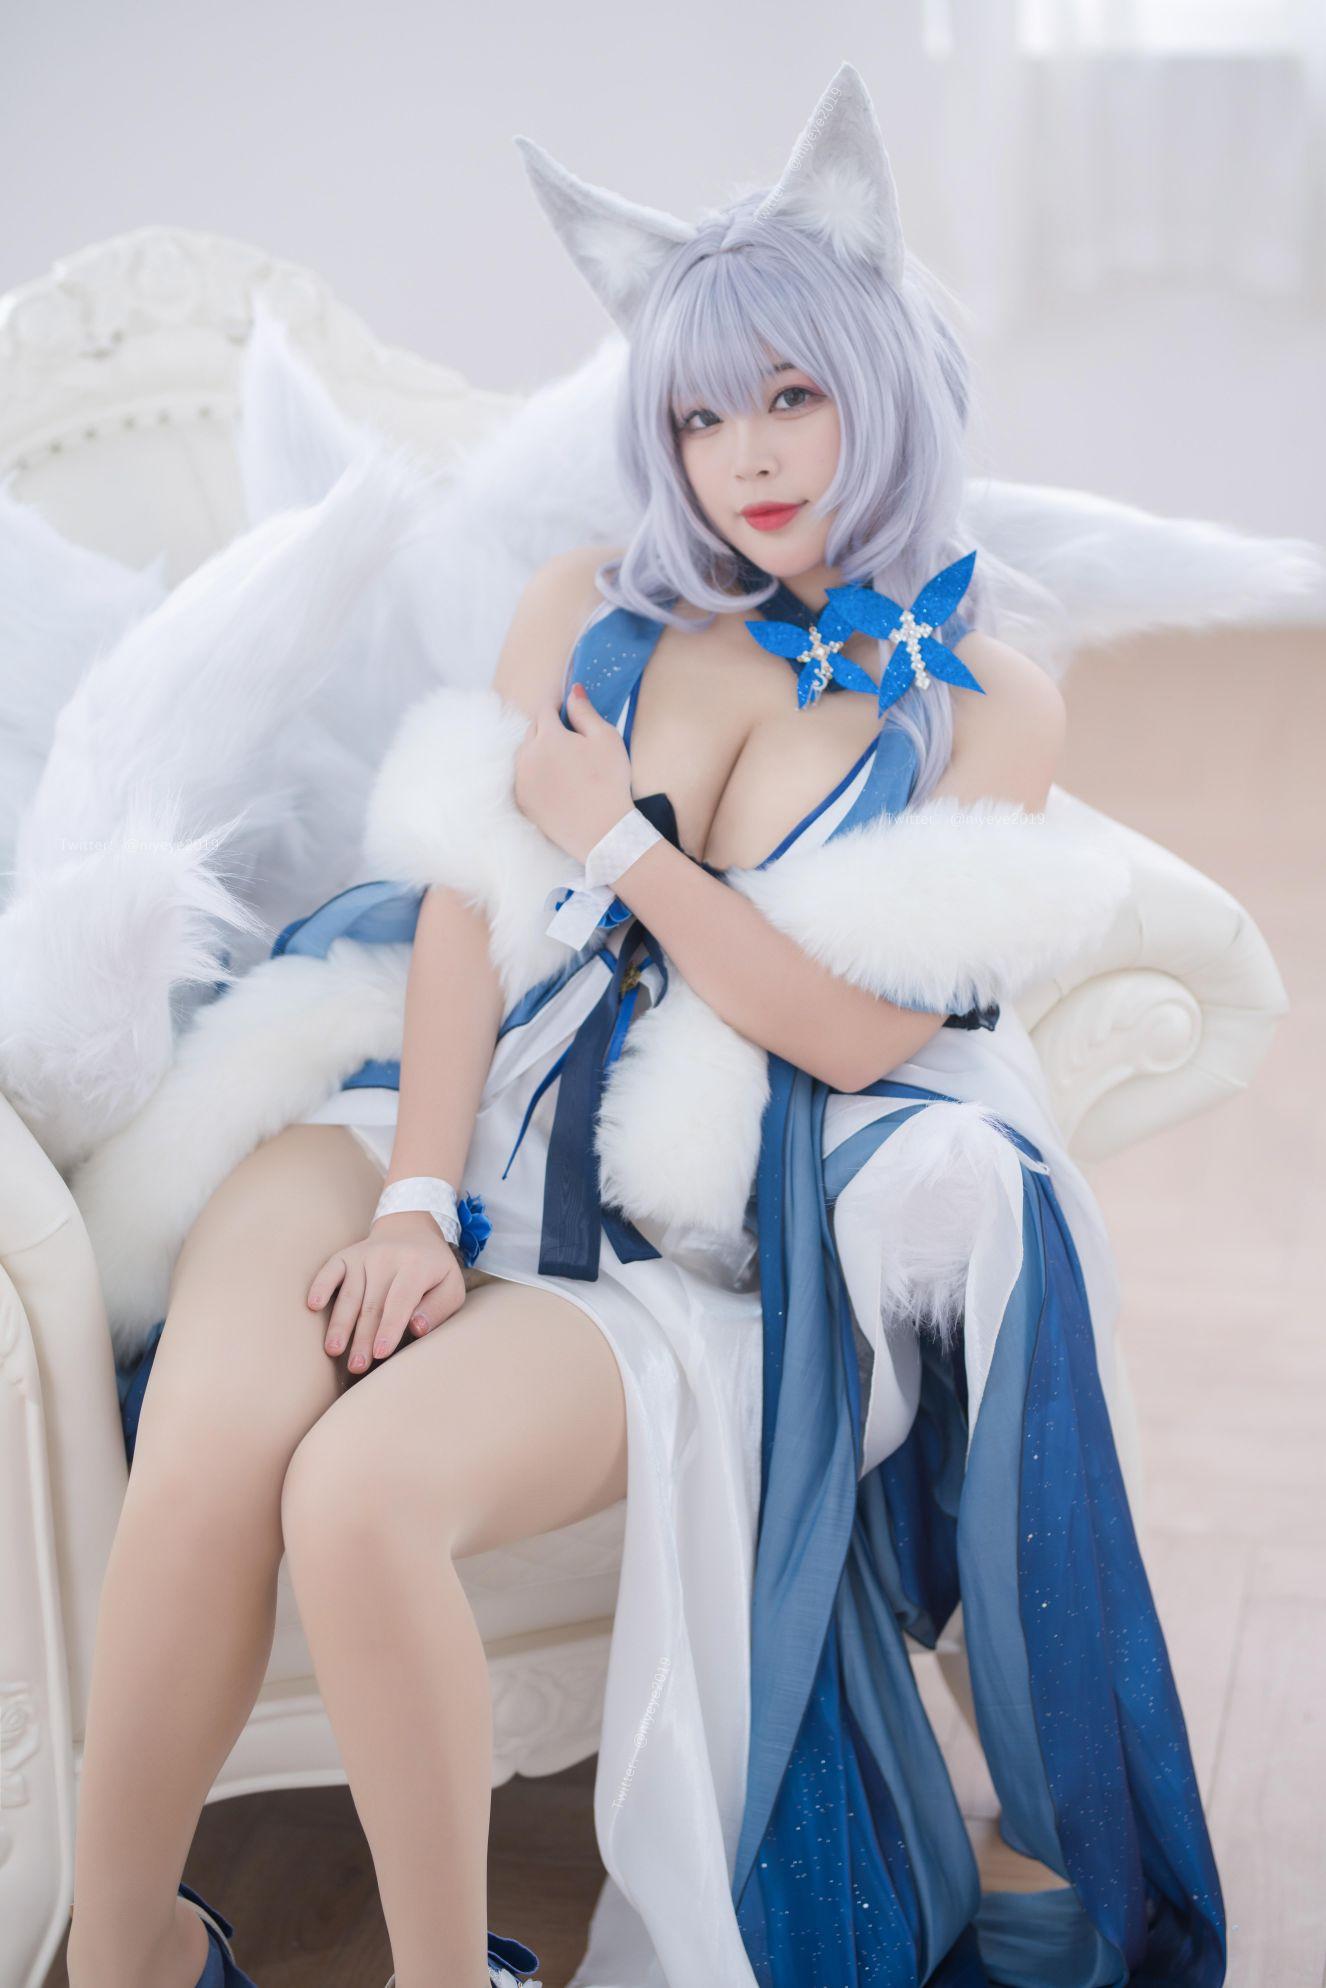 Azur Lane Shinano Cosplay by Bai Ye Extra Enticing Inviting 44